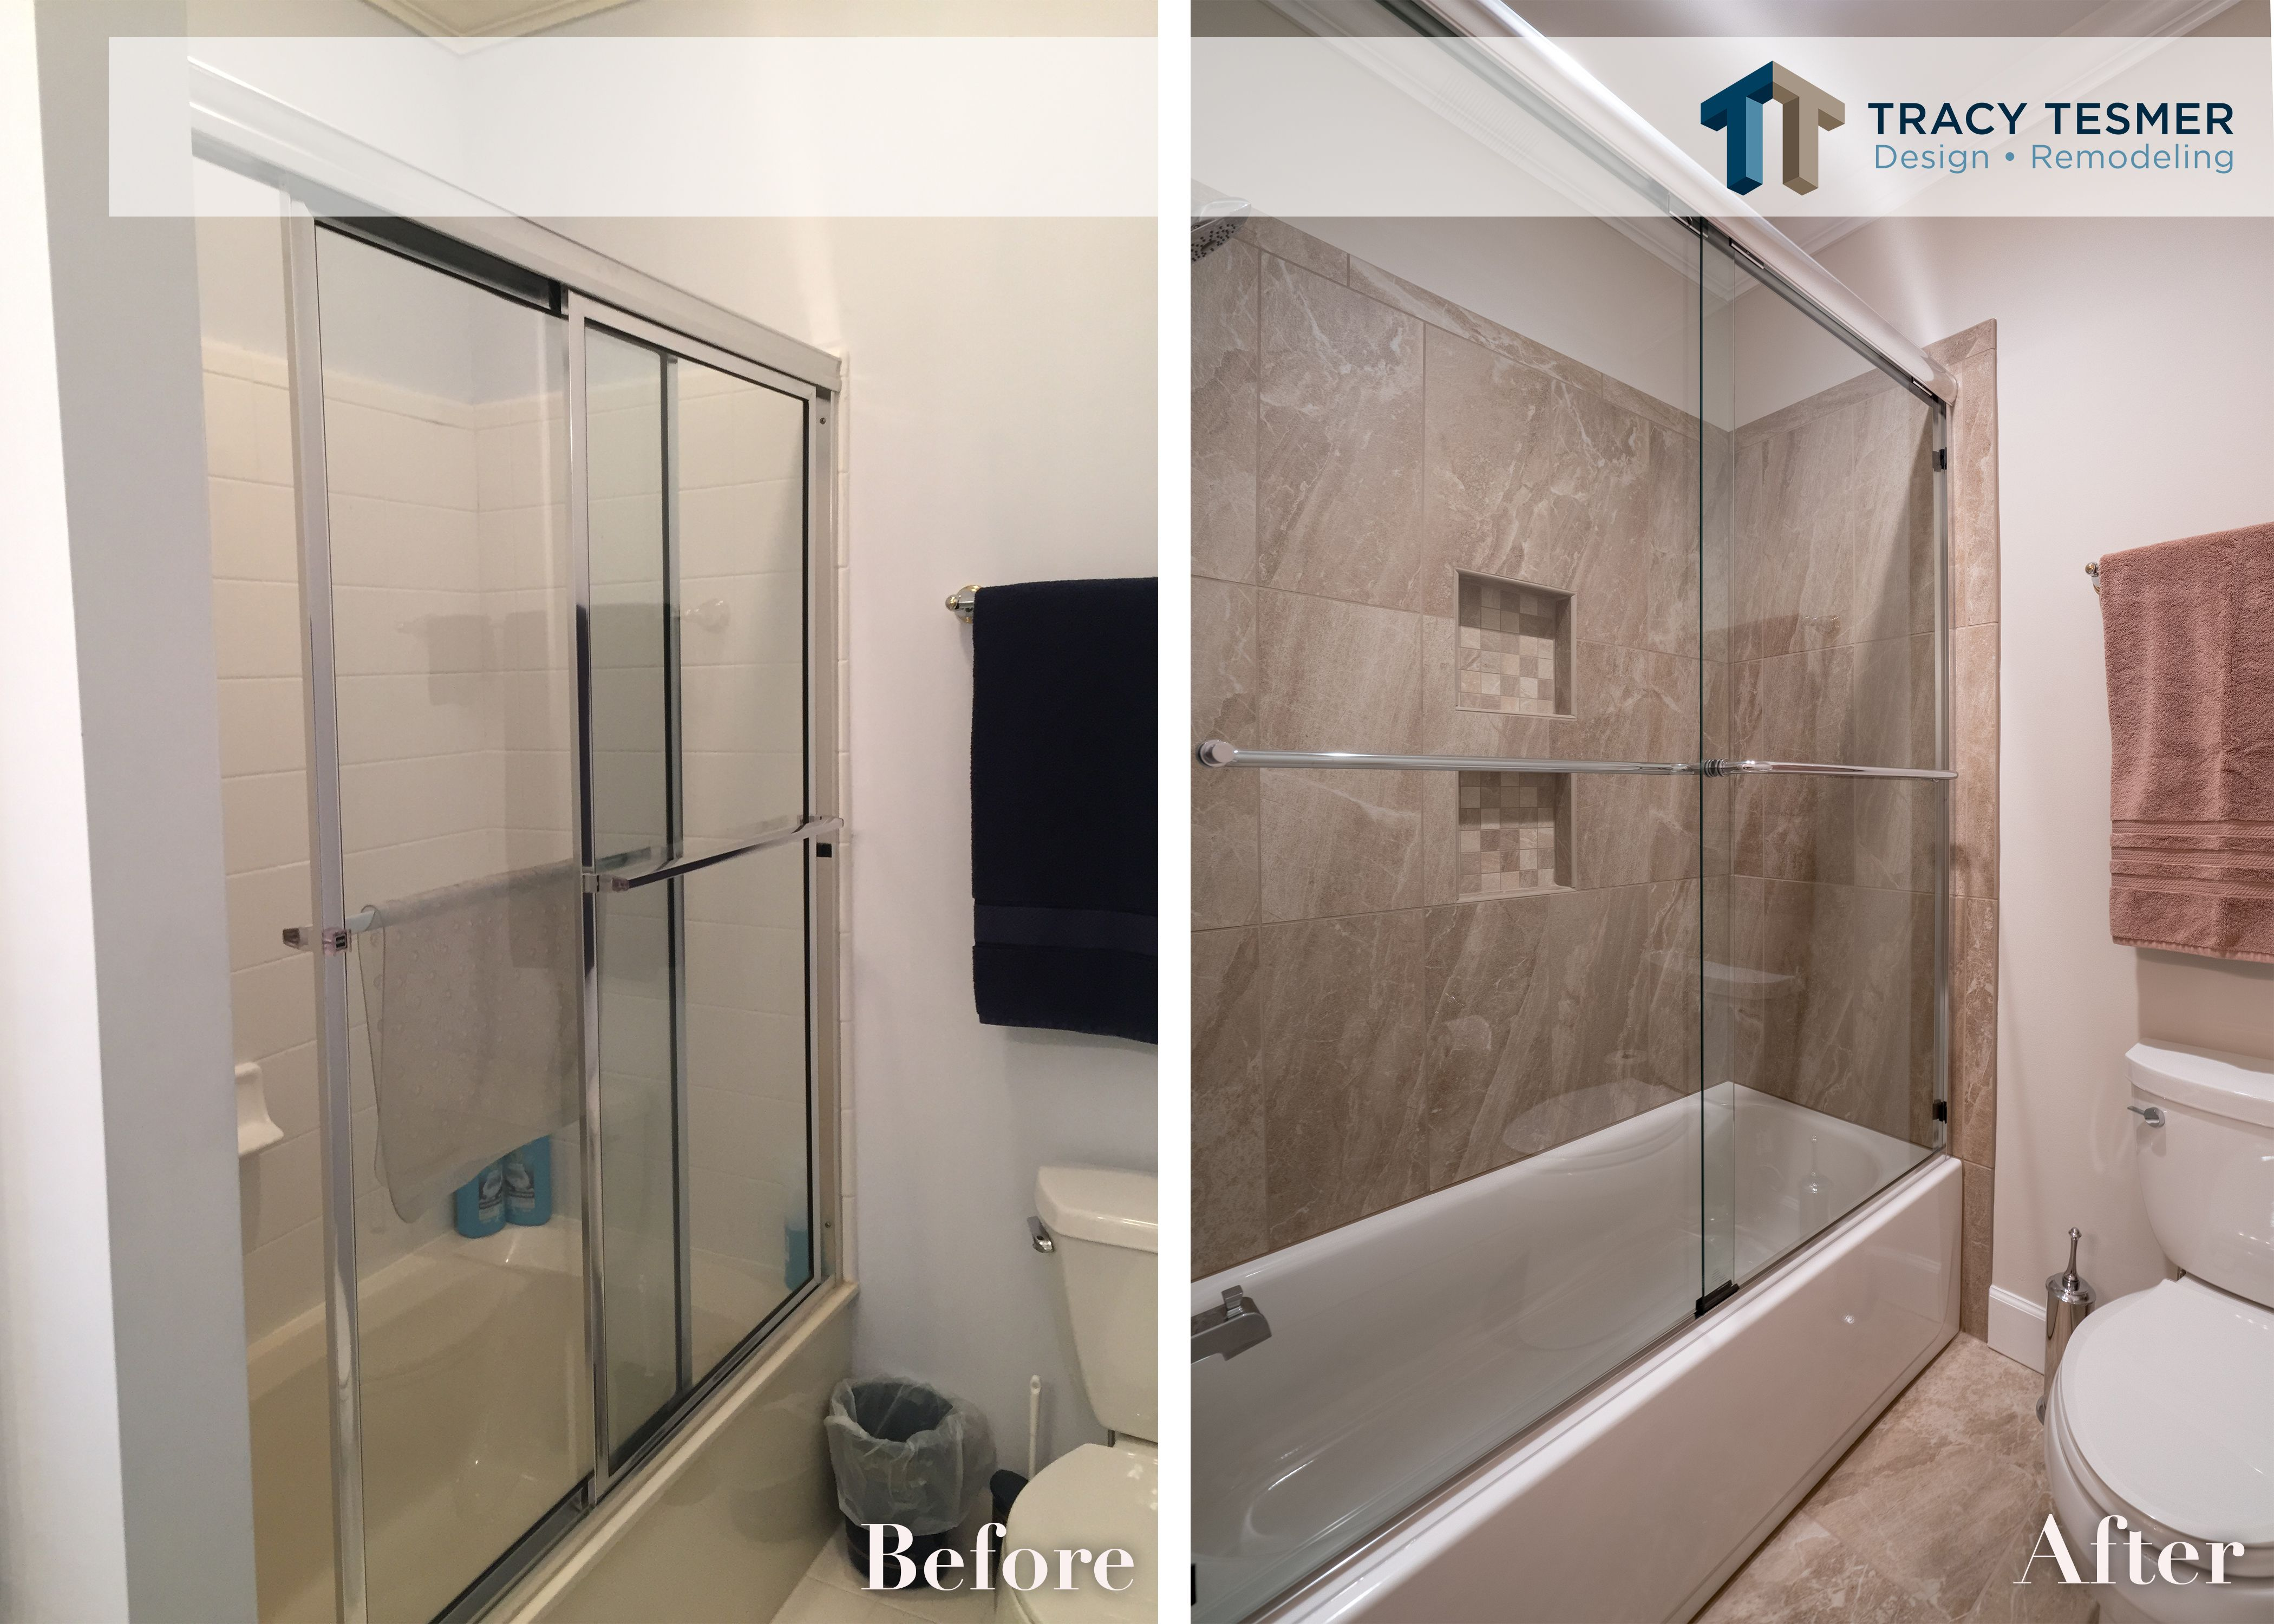 Guest Bathroom Remodeling Before And After Bathroom Mirror Design Bathroom Remodel Shower Trendy Bathroom Tiles